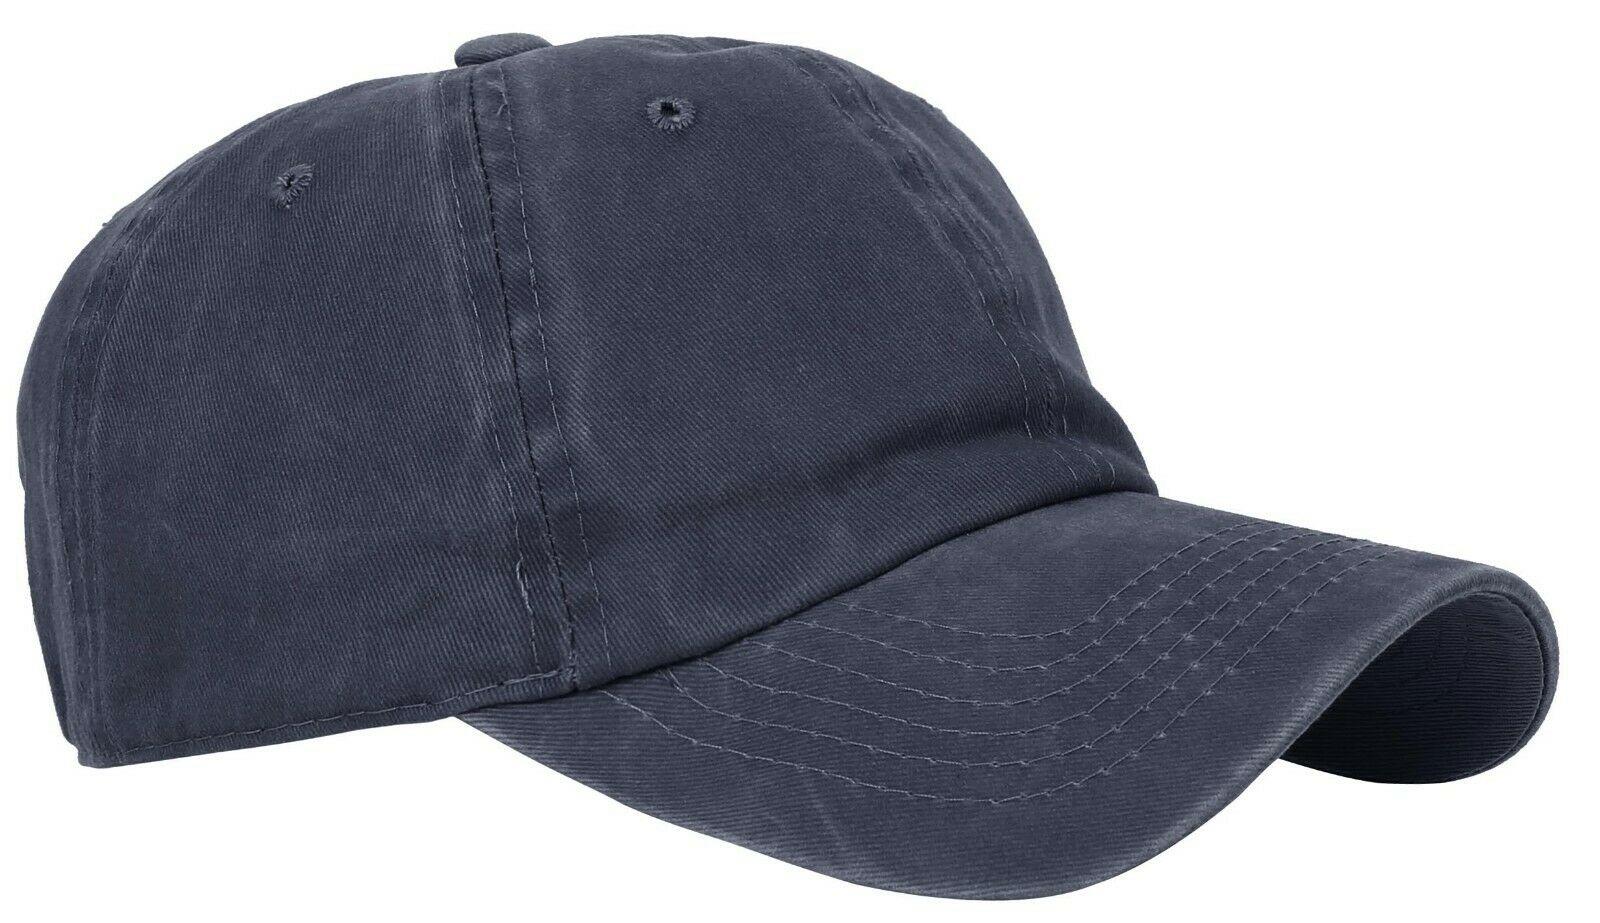 BASEBALL-CAP-Plain-Dad-Hat-Low-Profile-Vintage-Washed-Pigment-Adjustable thumbnail 3